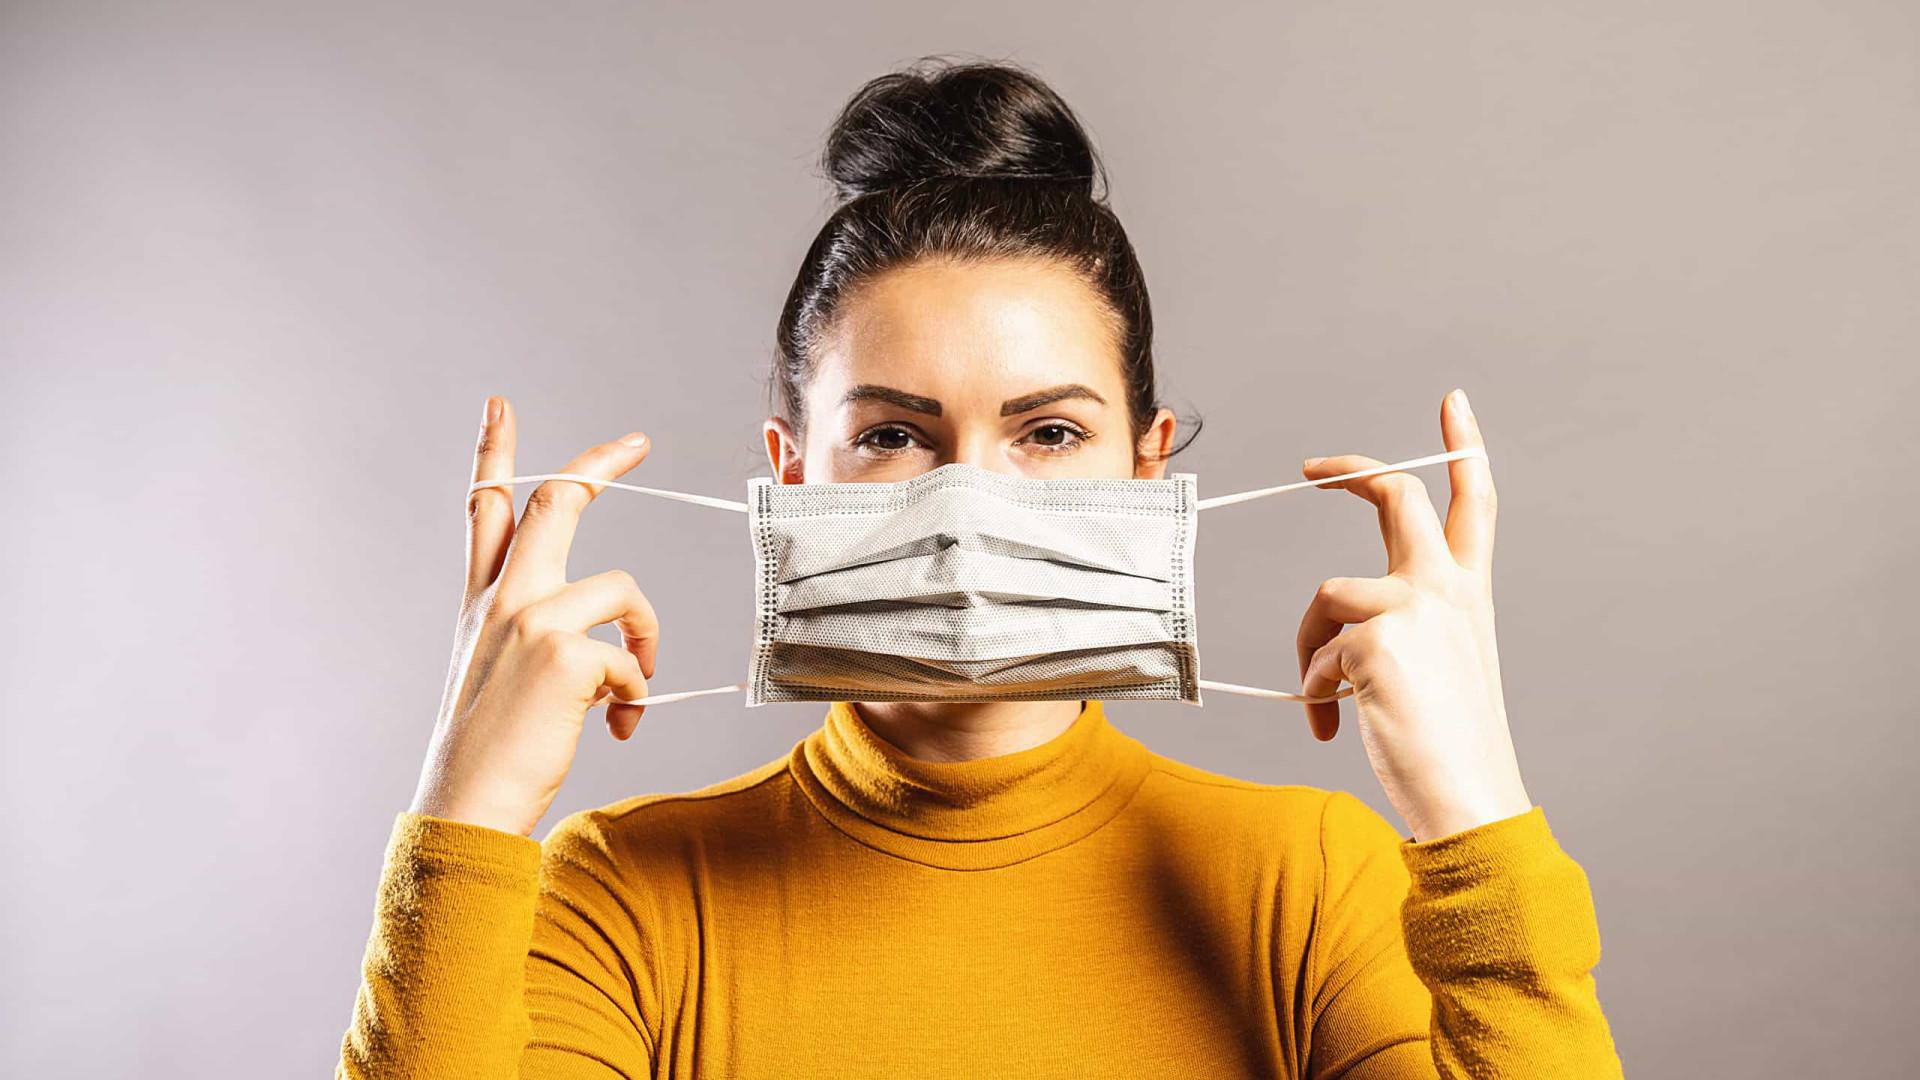 Máscara de 3 camadas protege 100% contra gotículas de espirro e tosse